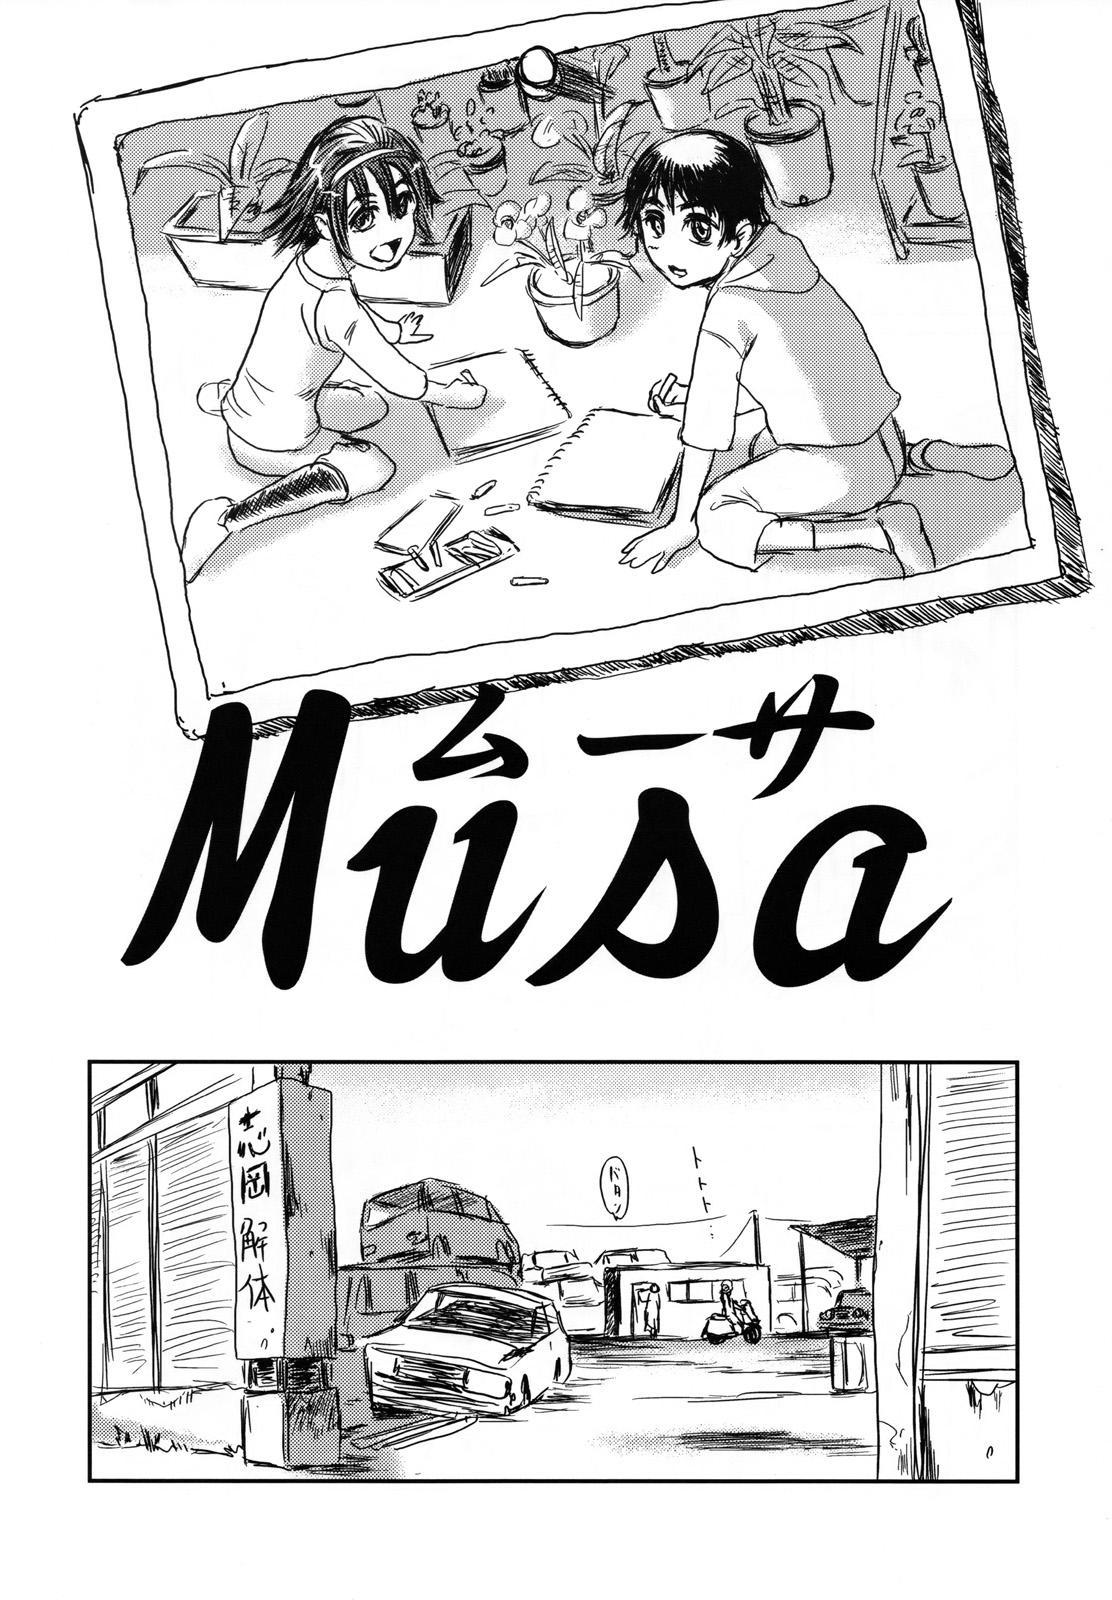 Musa 5